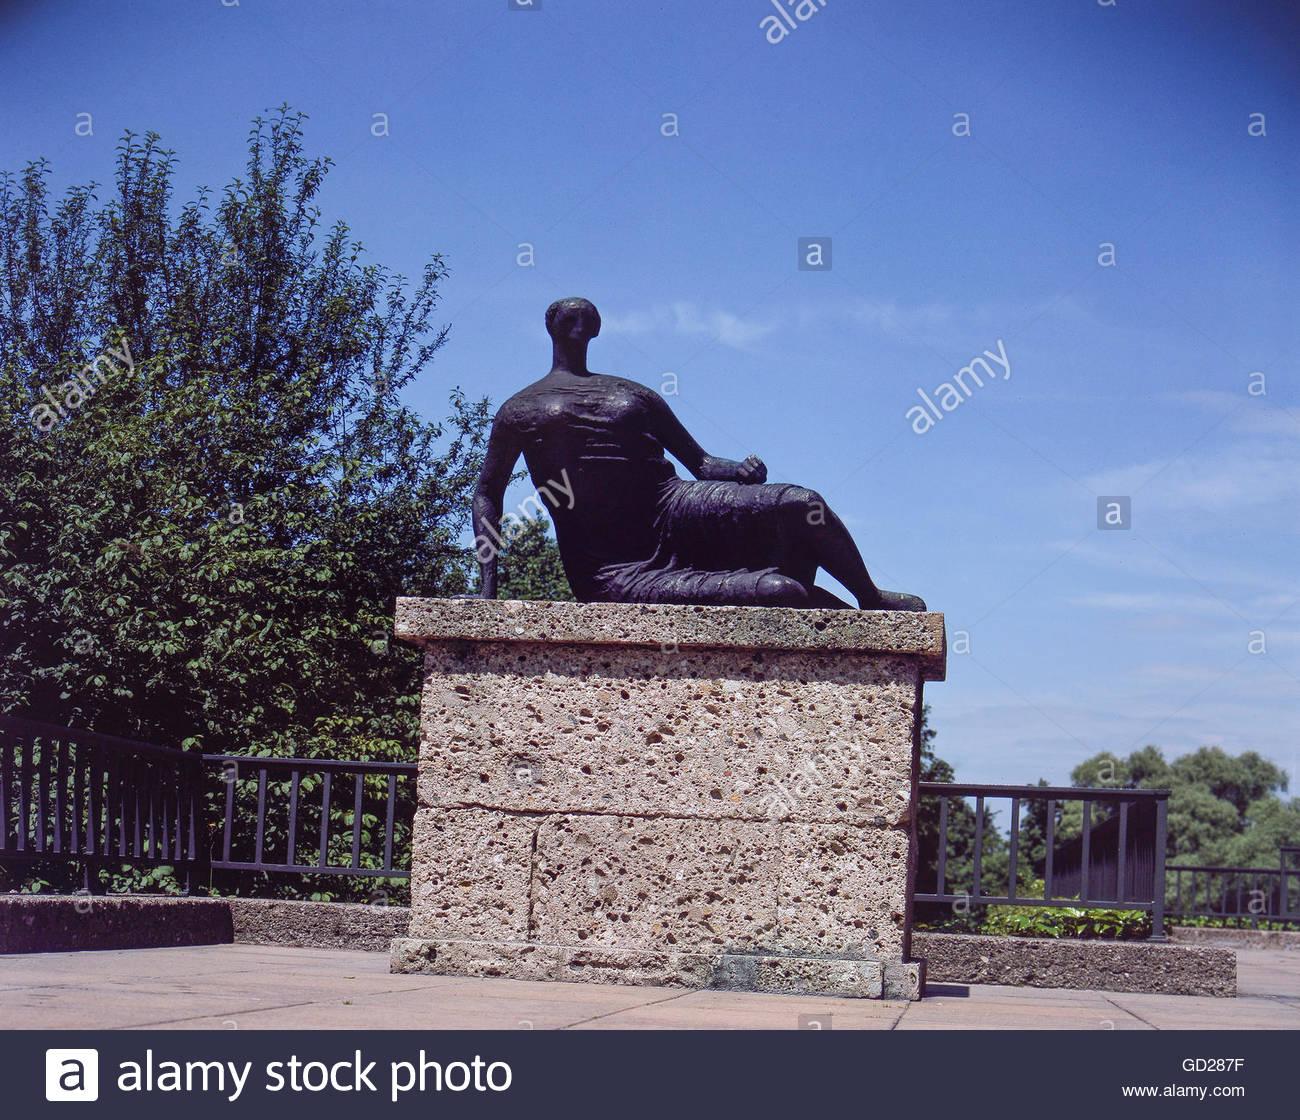 fine arts, Moore, Henry (1898 - 1986), sculpture, 'Grosse Liegende', bronze, 1957, in front of the Neue - Stock Image